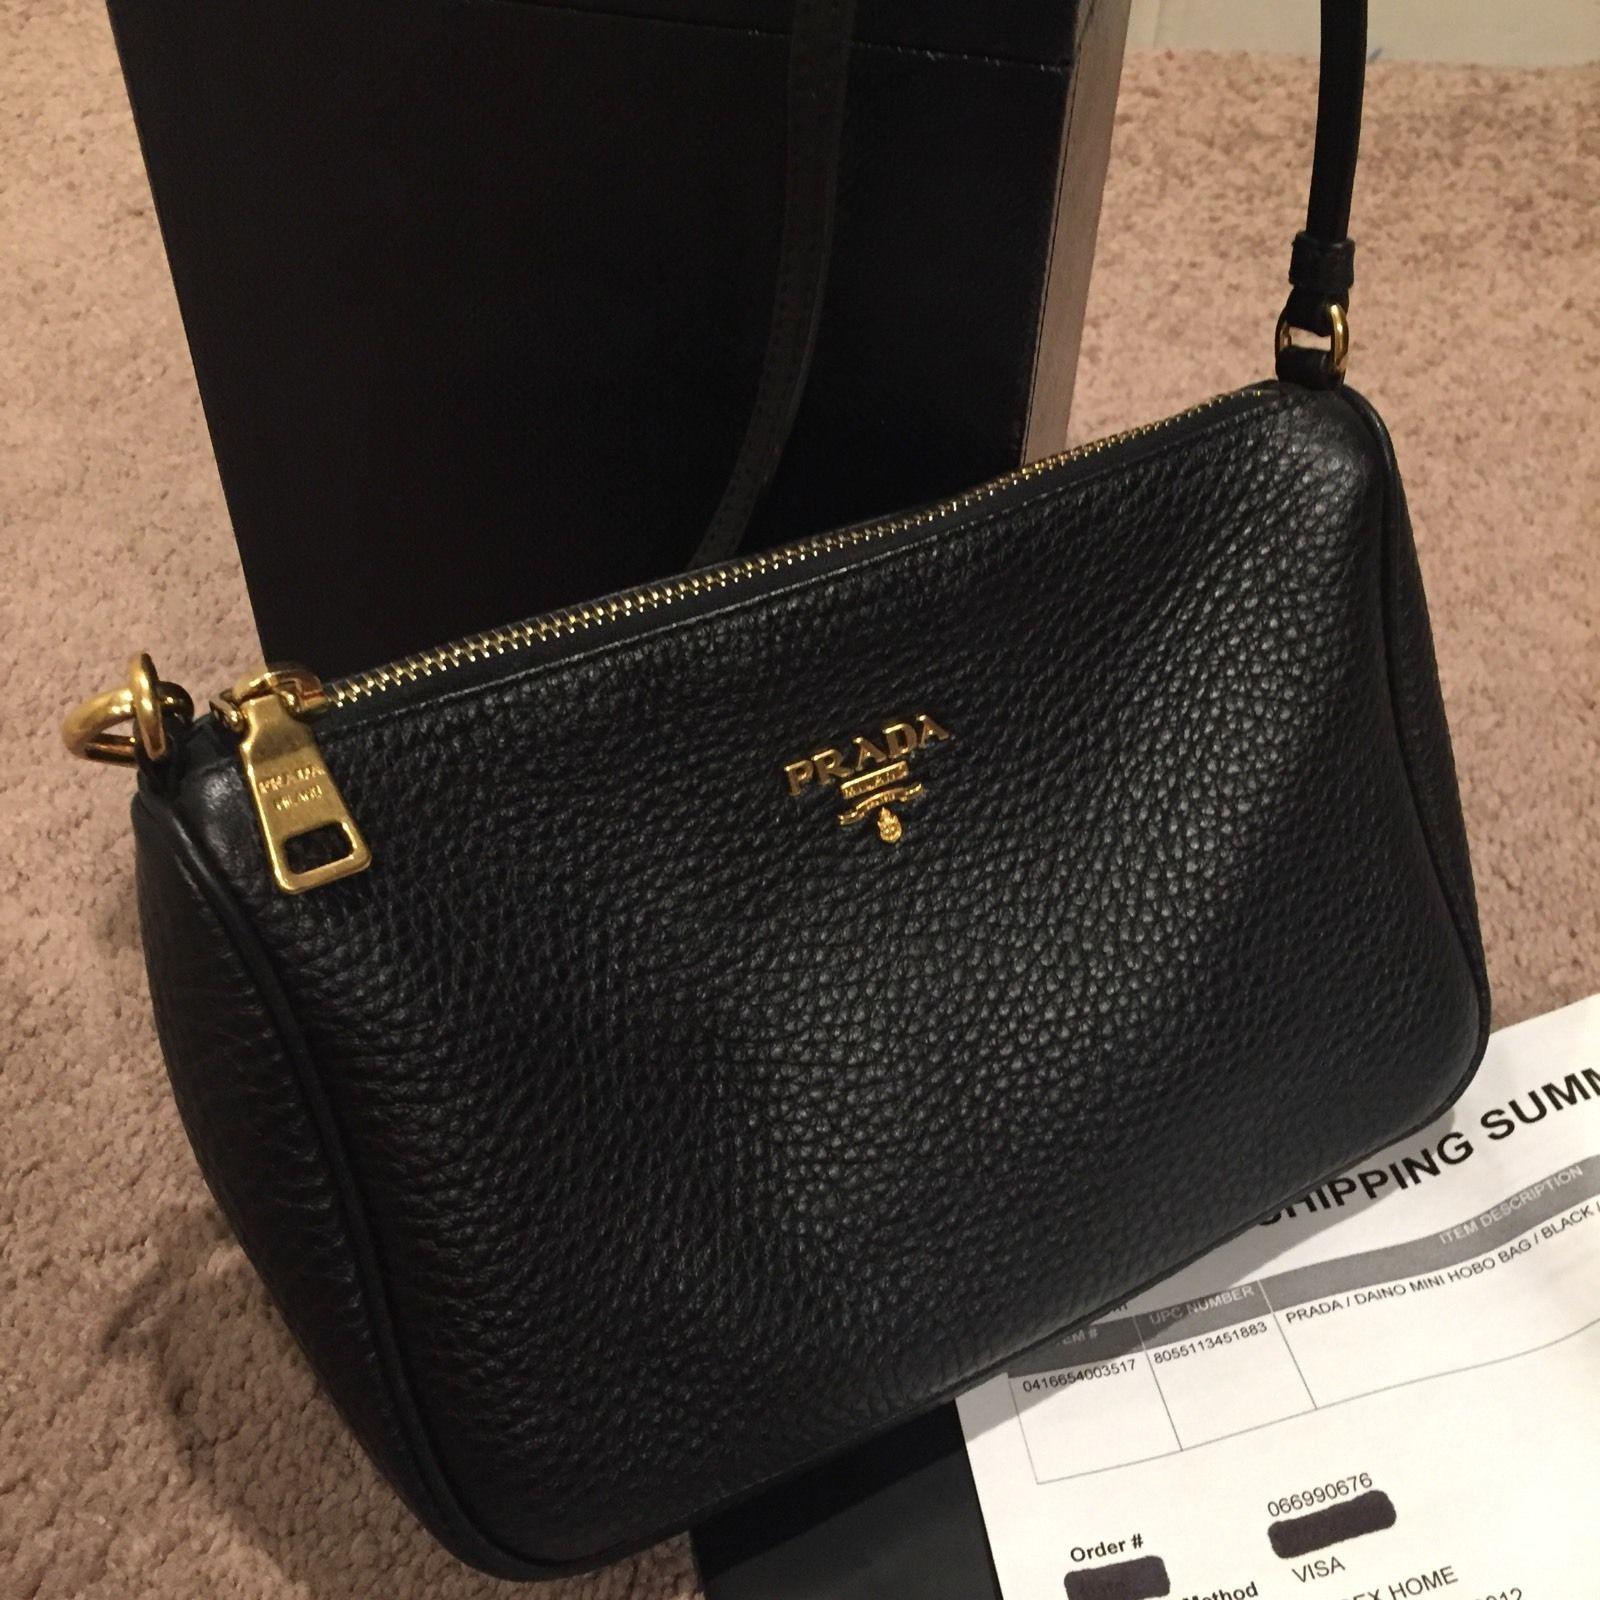 c5fa8595c2b0 ... shopping sold out prada daino hobo mini black leather shoulder bag  399.99 9bf60 ceb6b ...